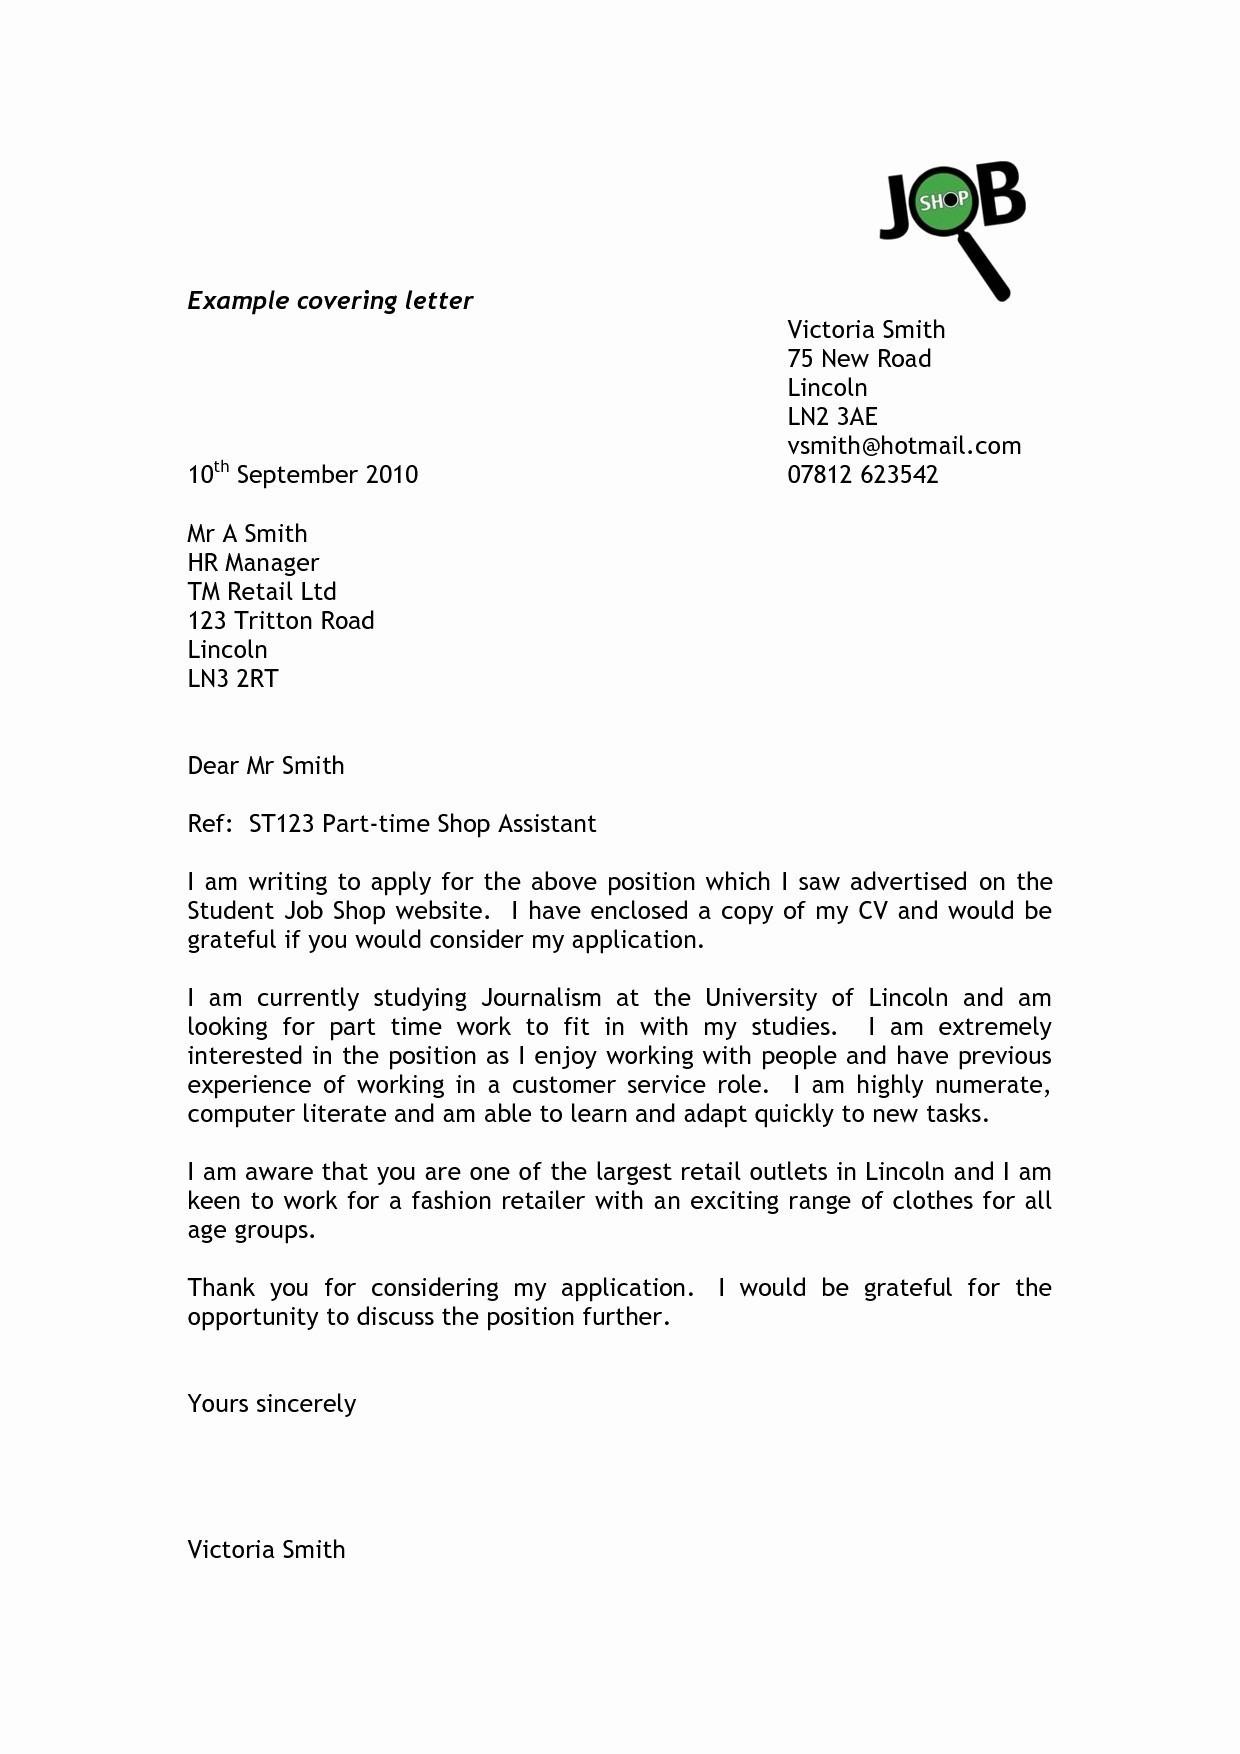 Hr Cover Letter Template - format Covering Letter for Cv